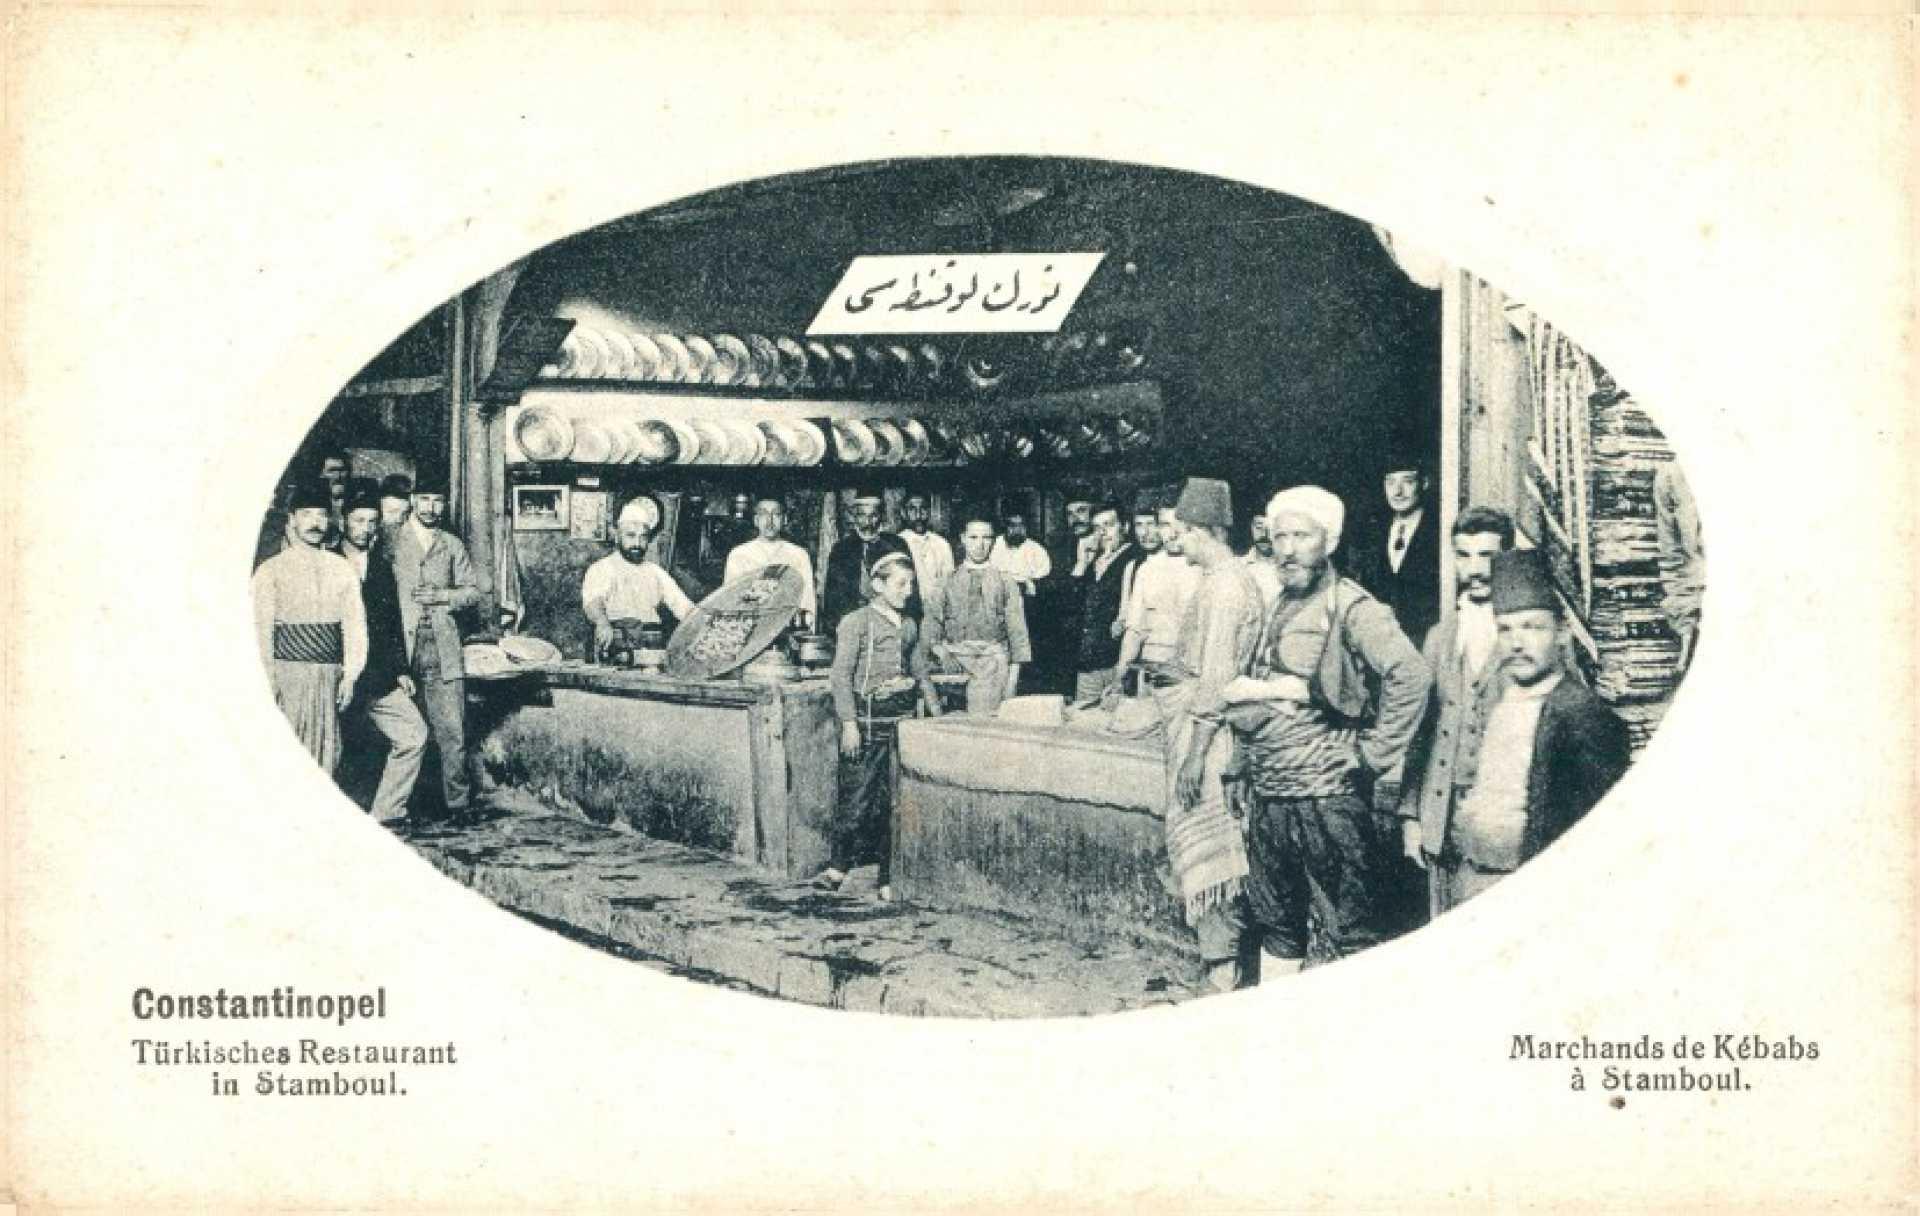 Türksches Restaurant in Stambul. Marchands de Kebabs a Stamboul